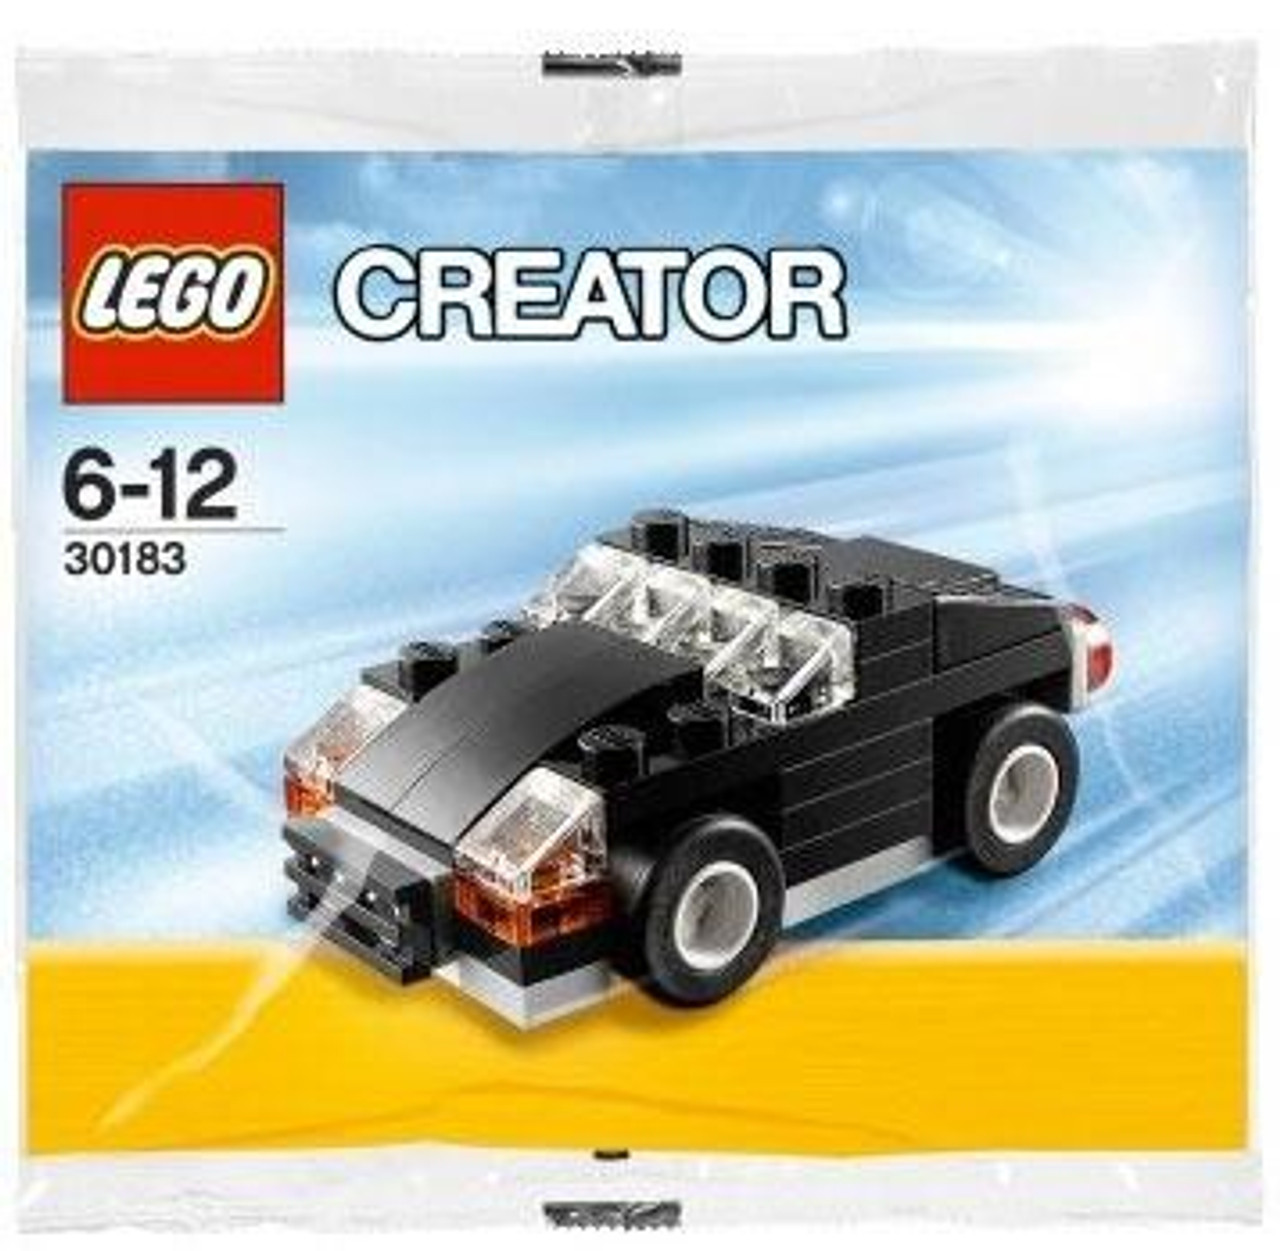 LEGO Creator Little Car Mini Set #30183 [Bagged]